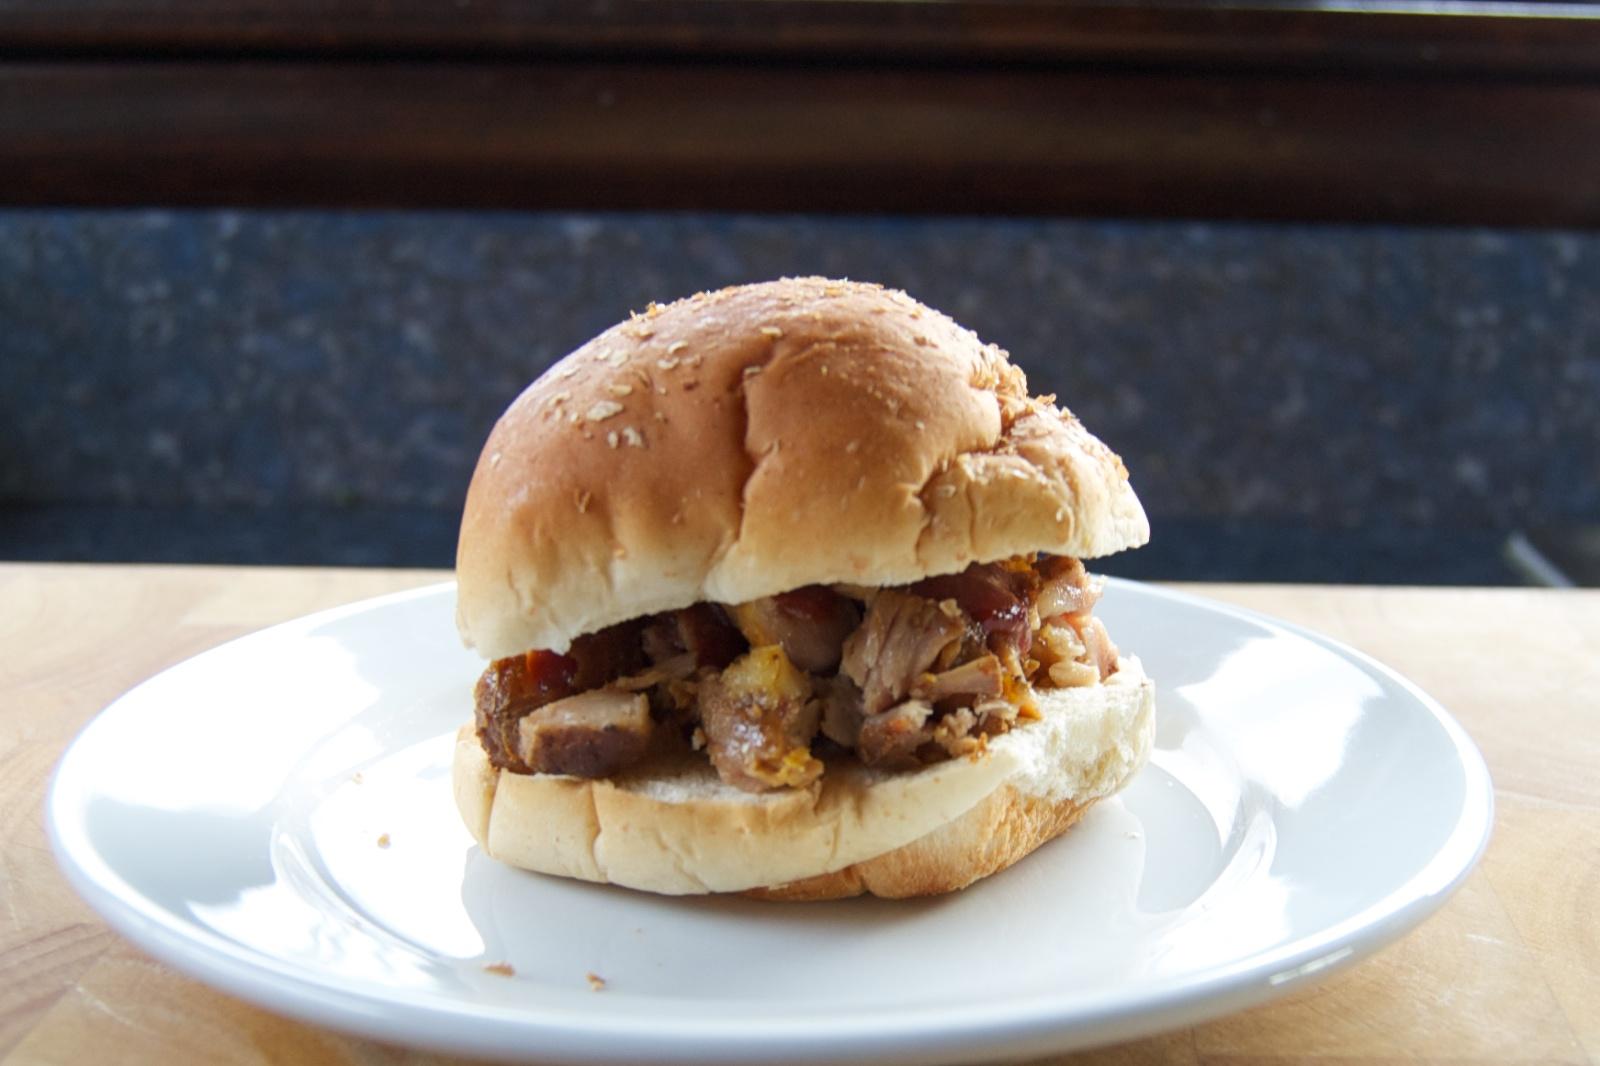 http://blog.rickk.com/food/2012/01/28/ate.2012.01.28.l.jpg